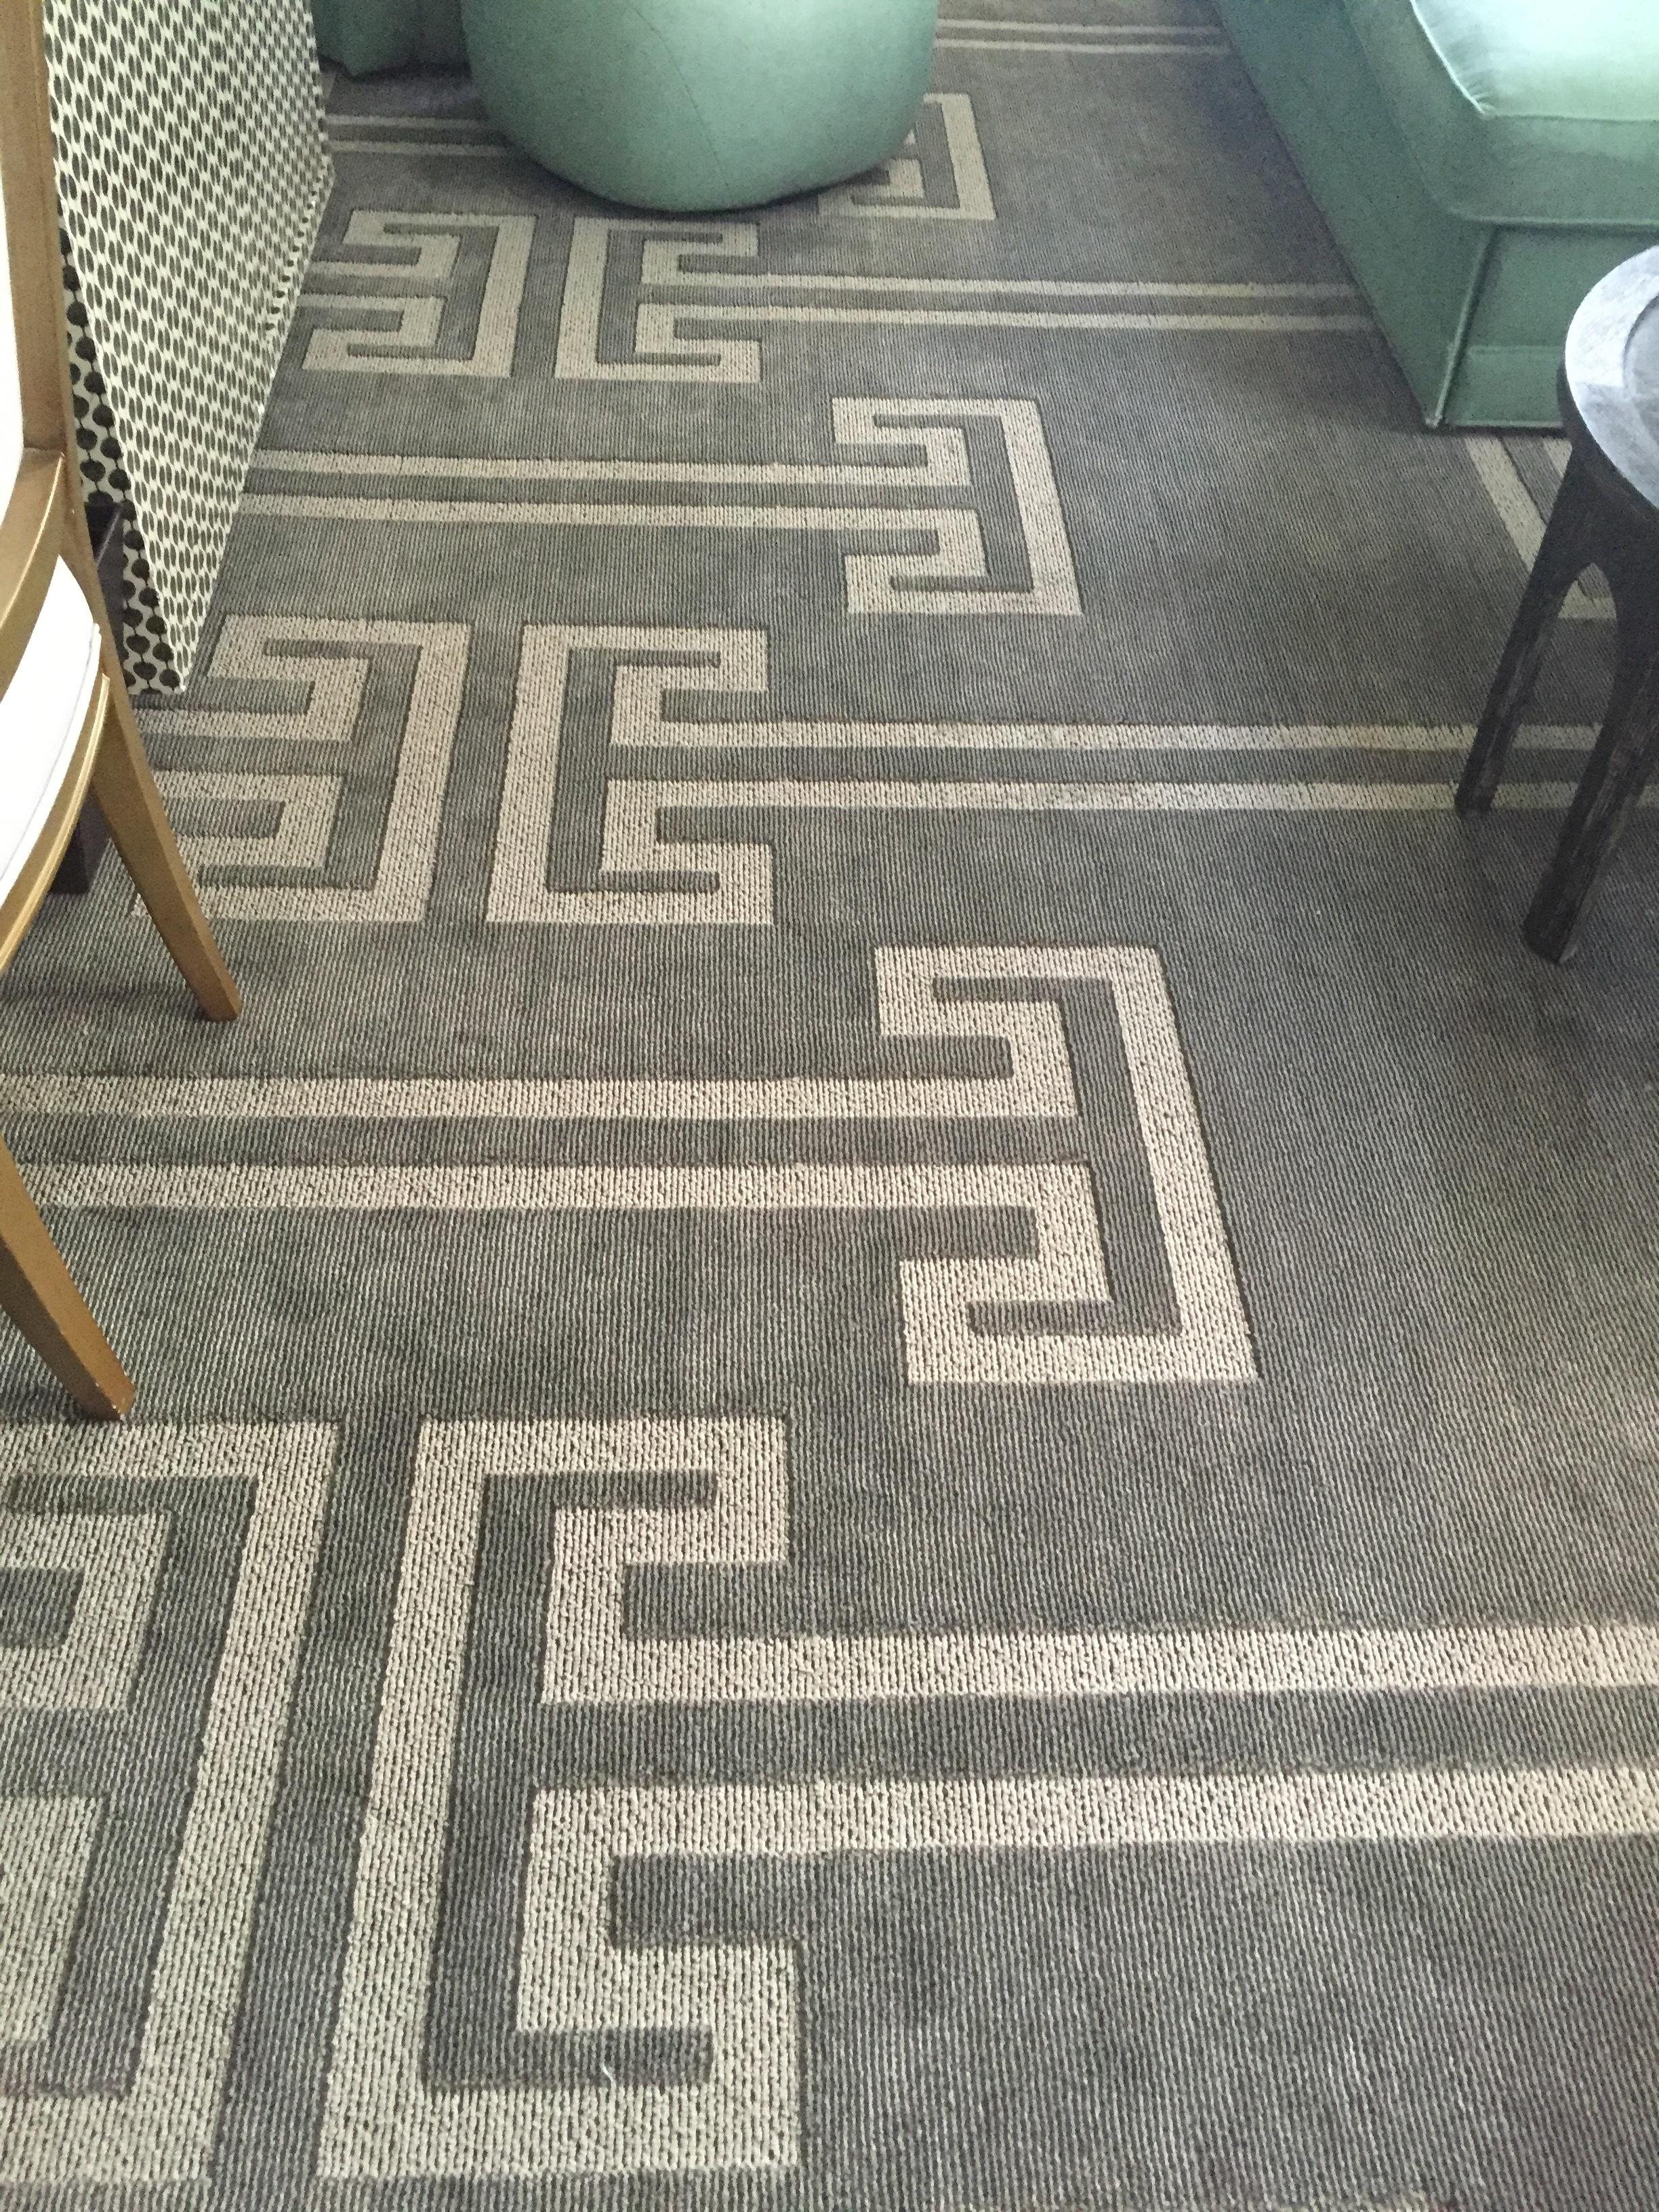 Viceroy Miami Corner Suite Carpet Detail